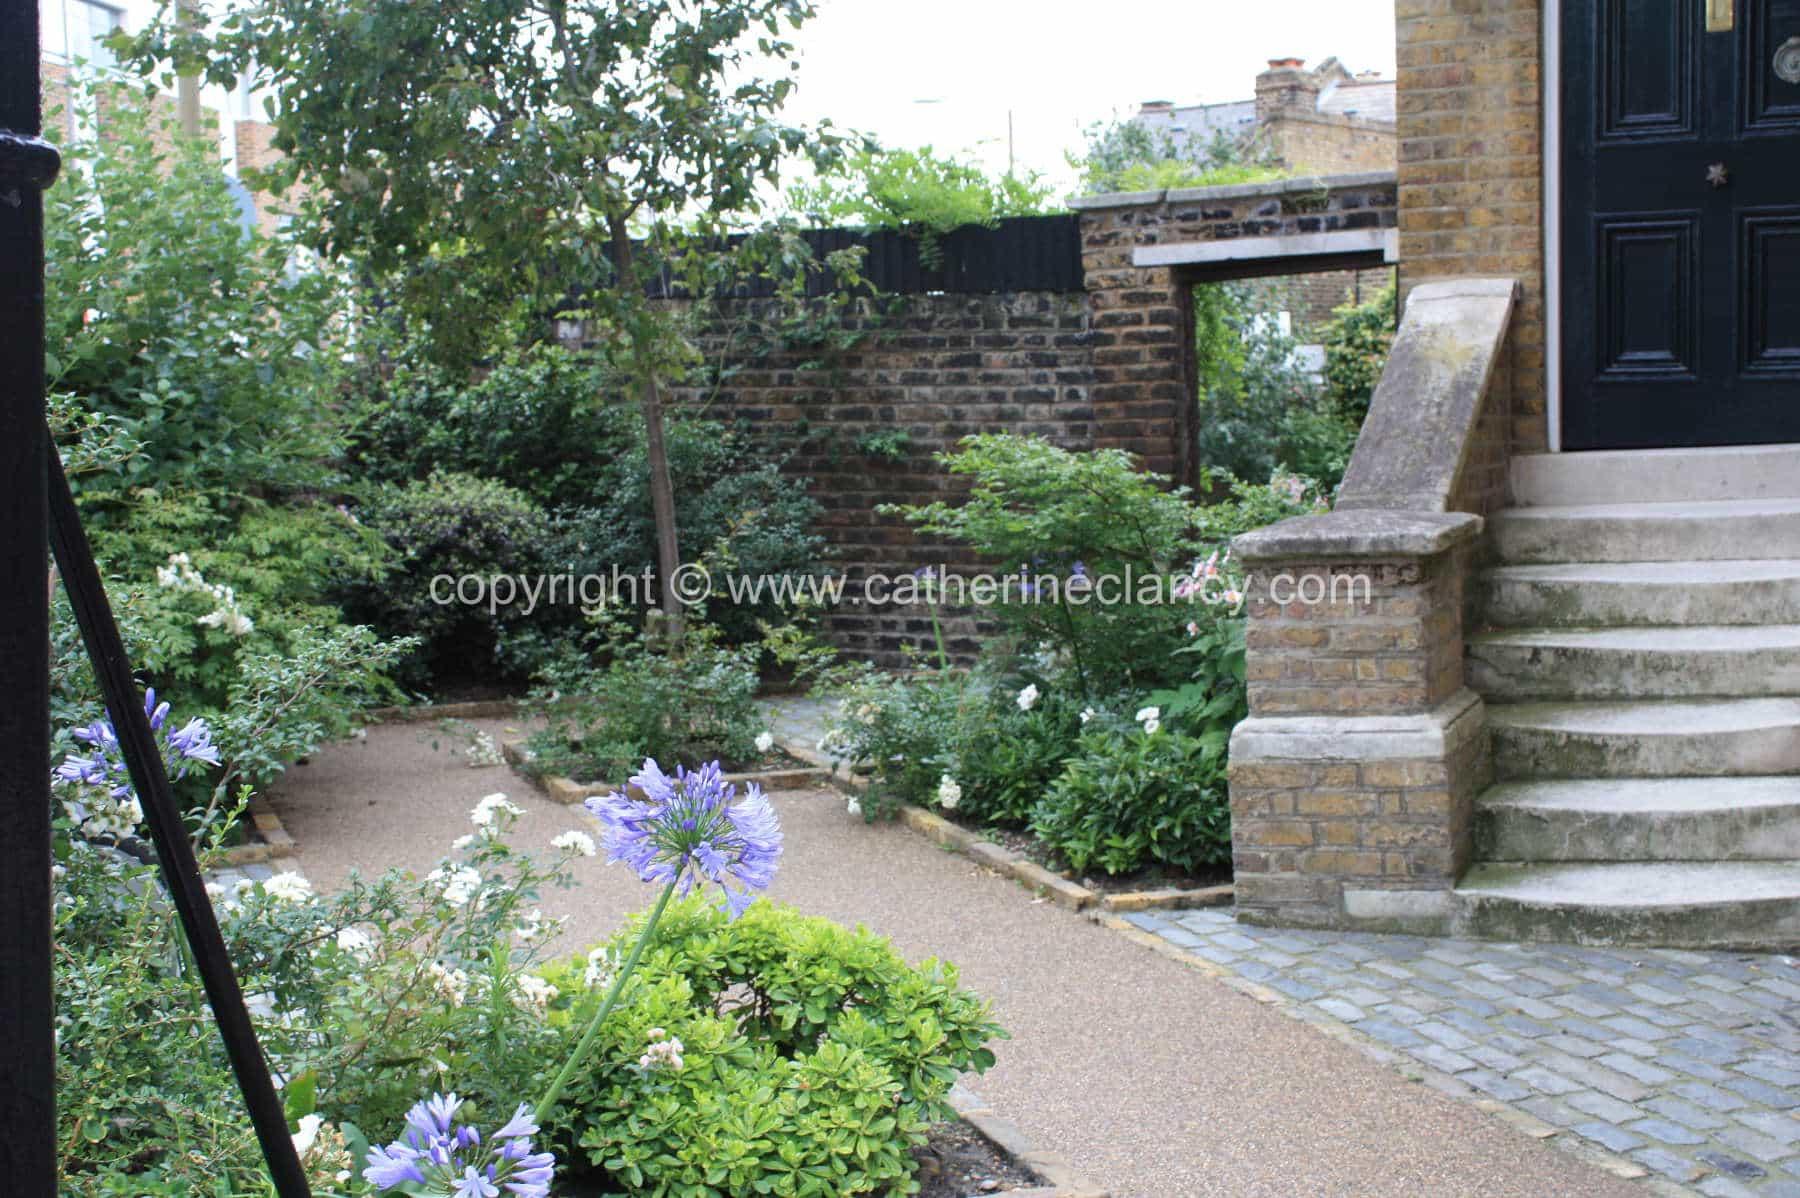 London Courtyard Front Garden 2